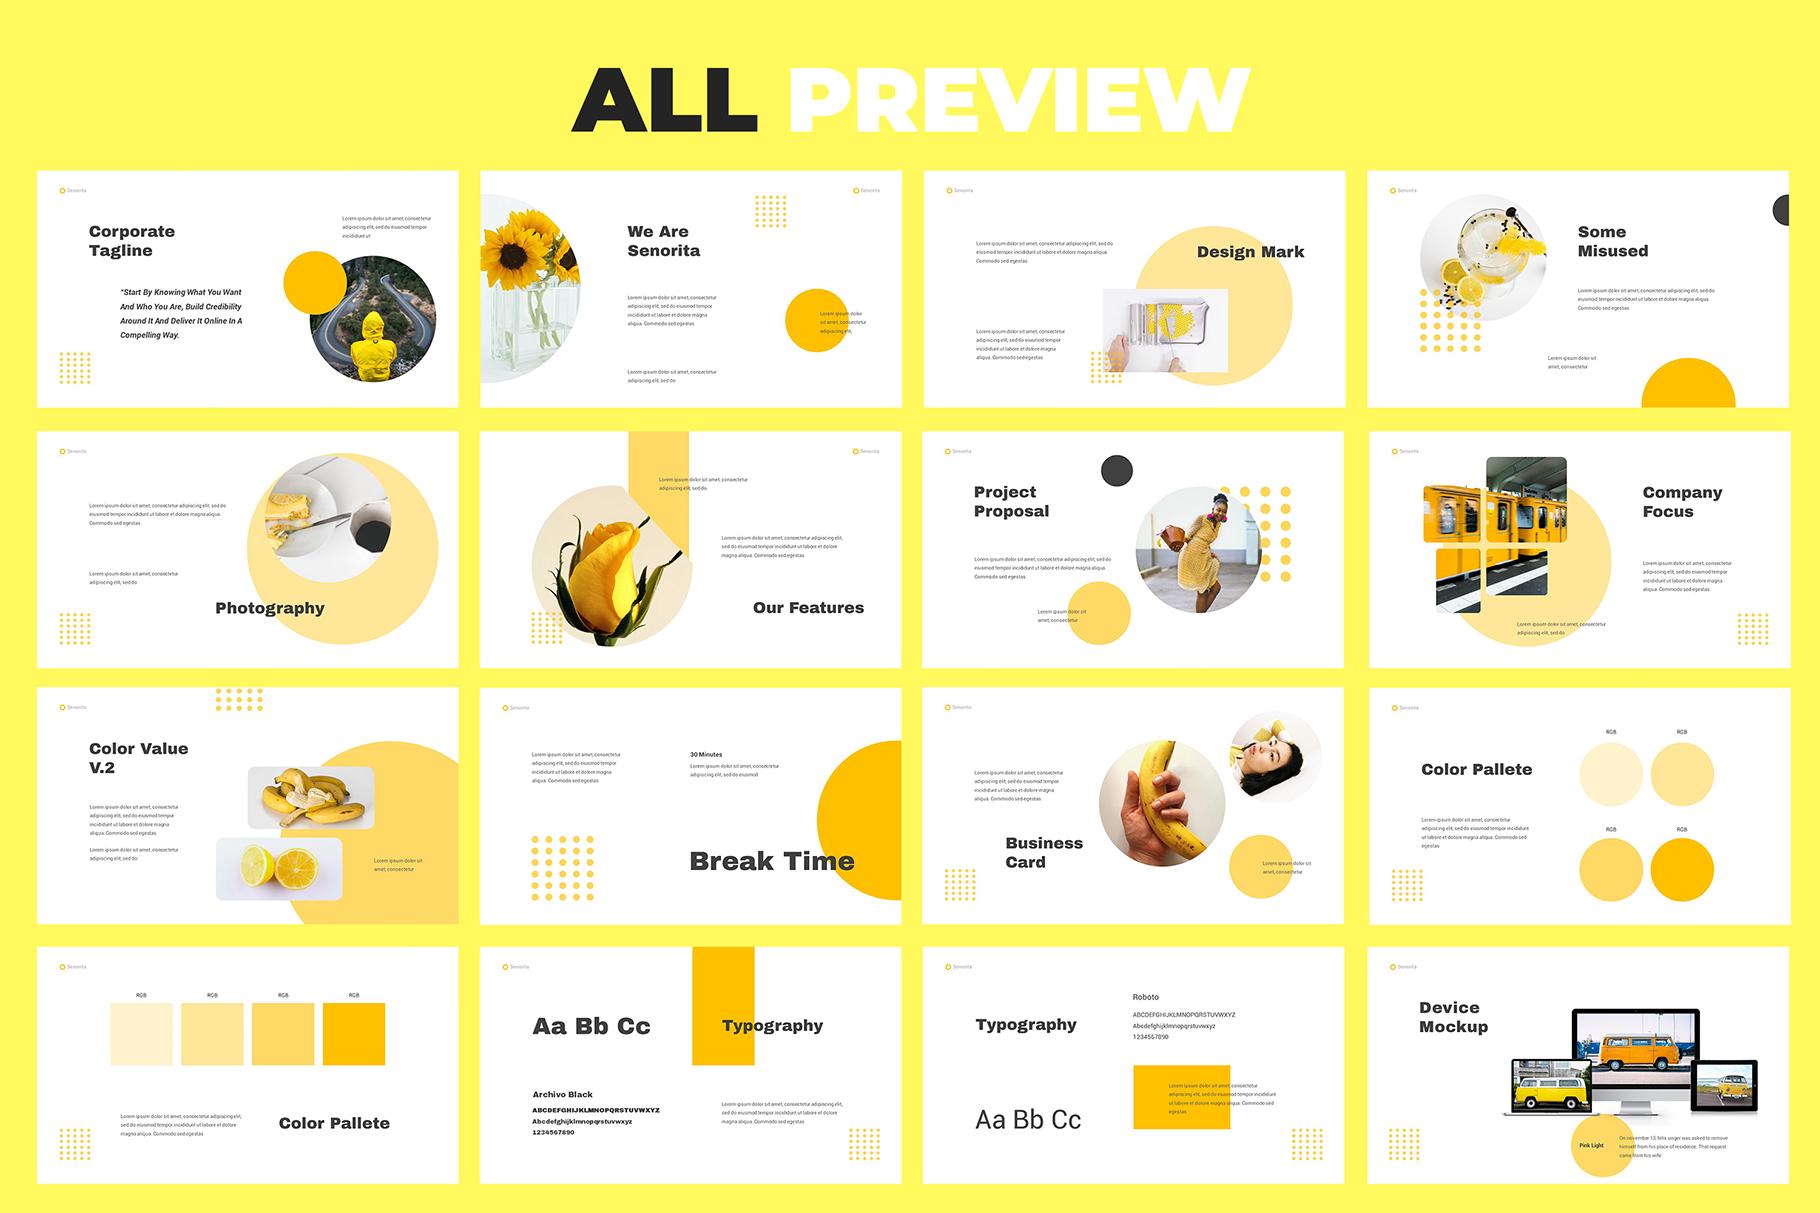 Senorita Brand Guideline Powerpoint example image 6